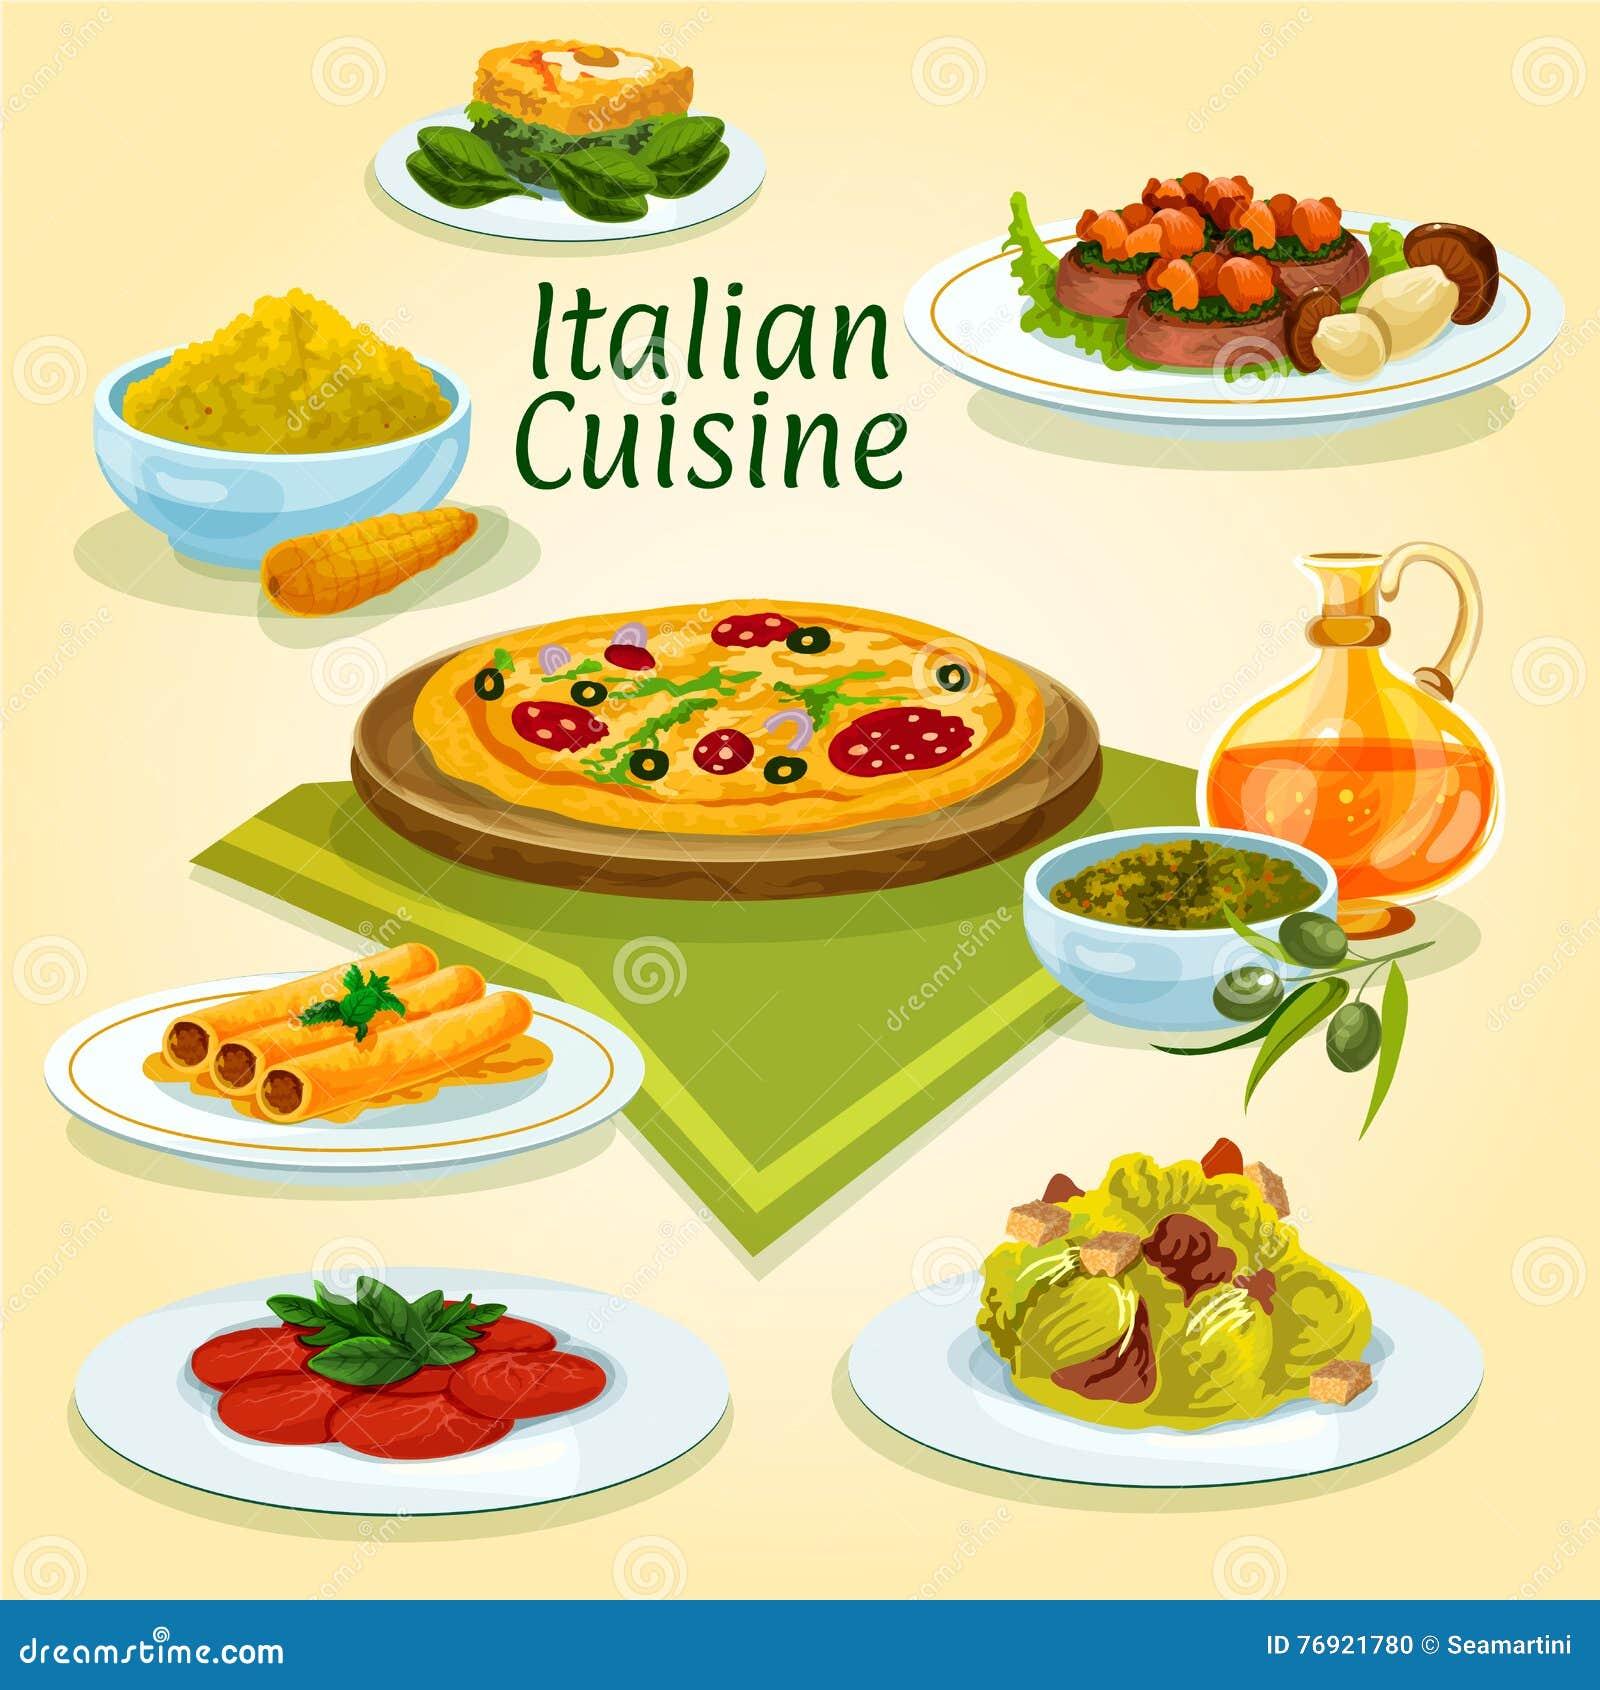 Italian cuisine national dishes for menu design stock - Italian cuisine menu list ...